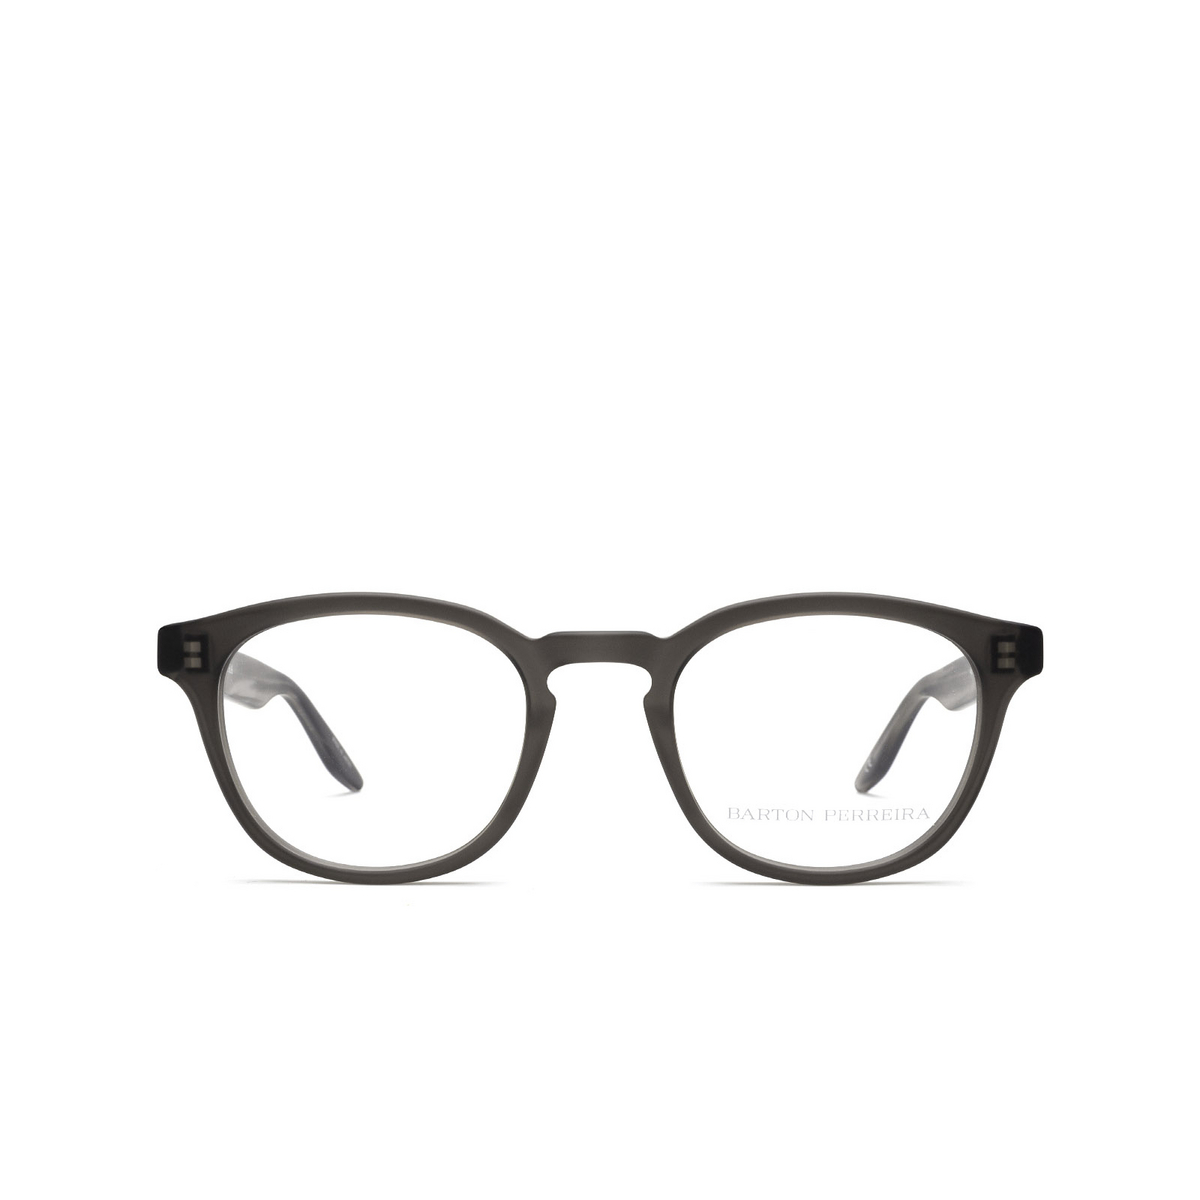 Barton Perreira® Square Eyeglasses: Gellert BP5027 color Matte Dusk Matte Grey 1KX - front view.